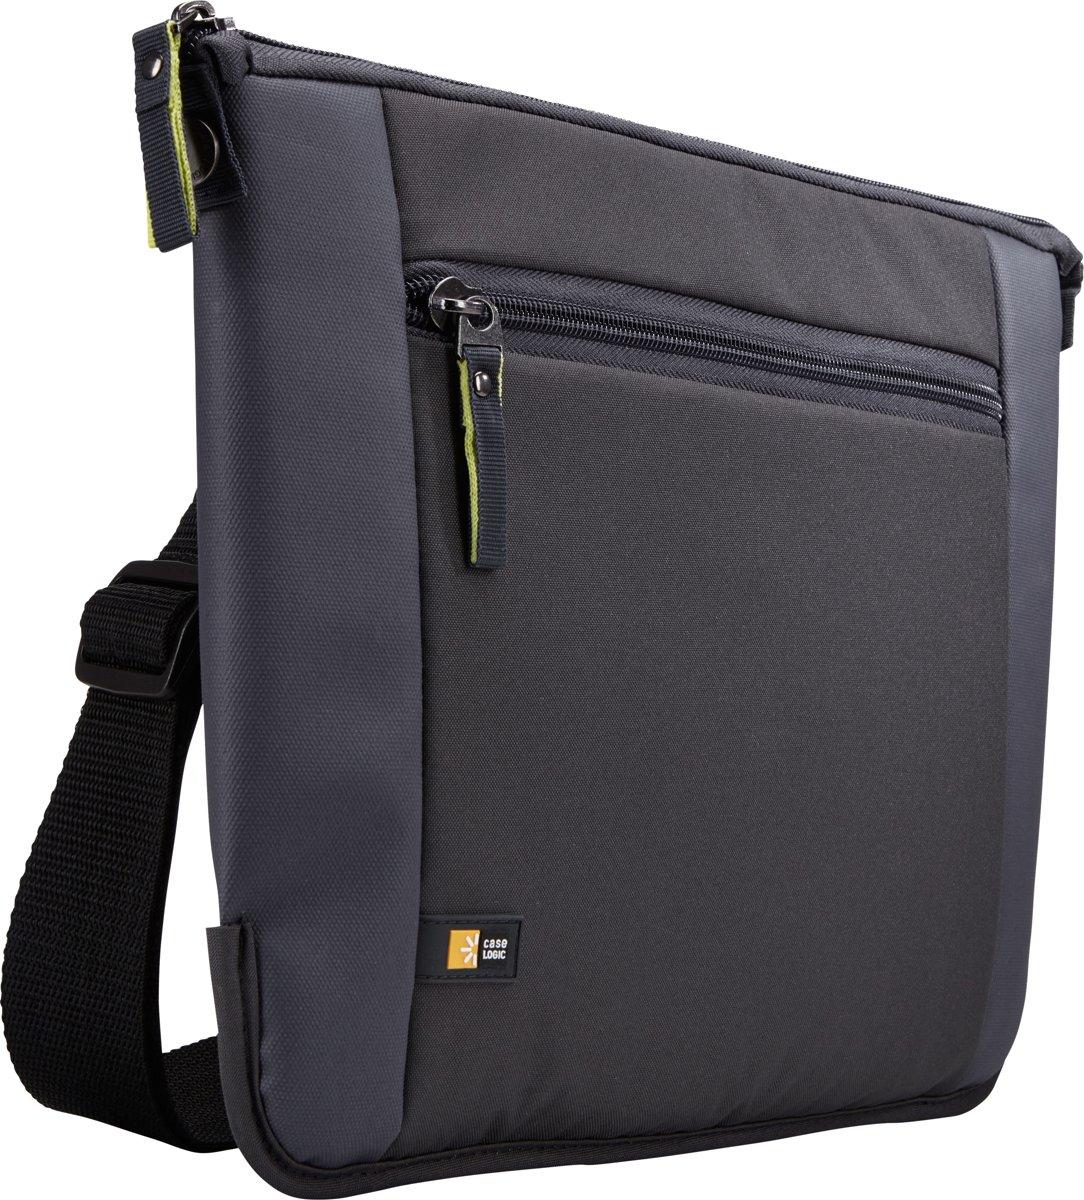 Case Logic Intrata Slim 14 inch Laptop Tas